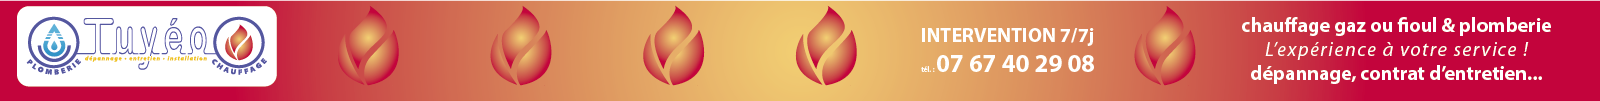 TUYEO : plomberie, chauffage...